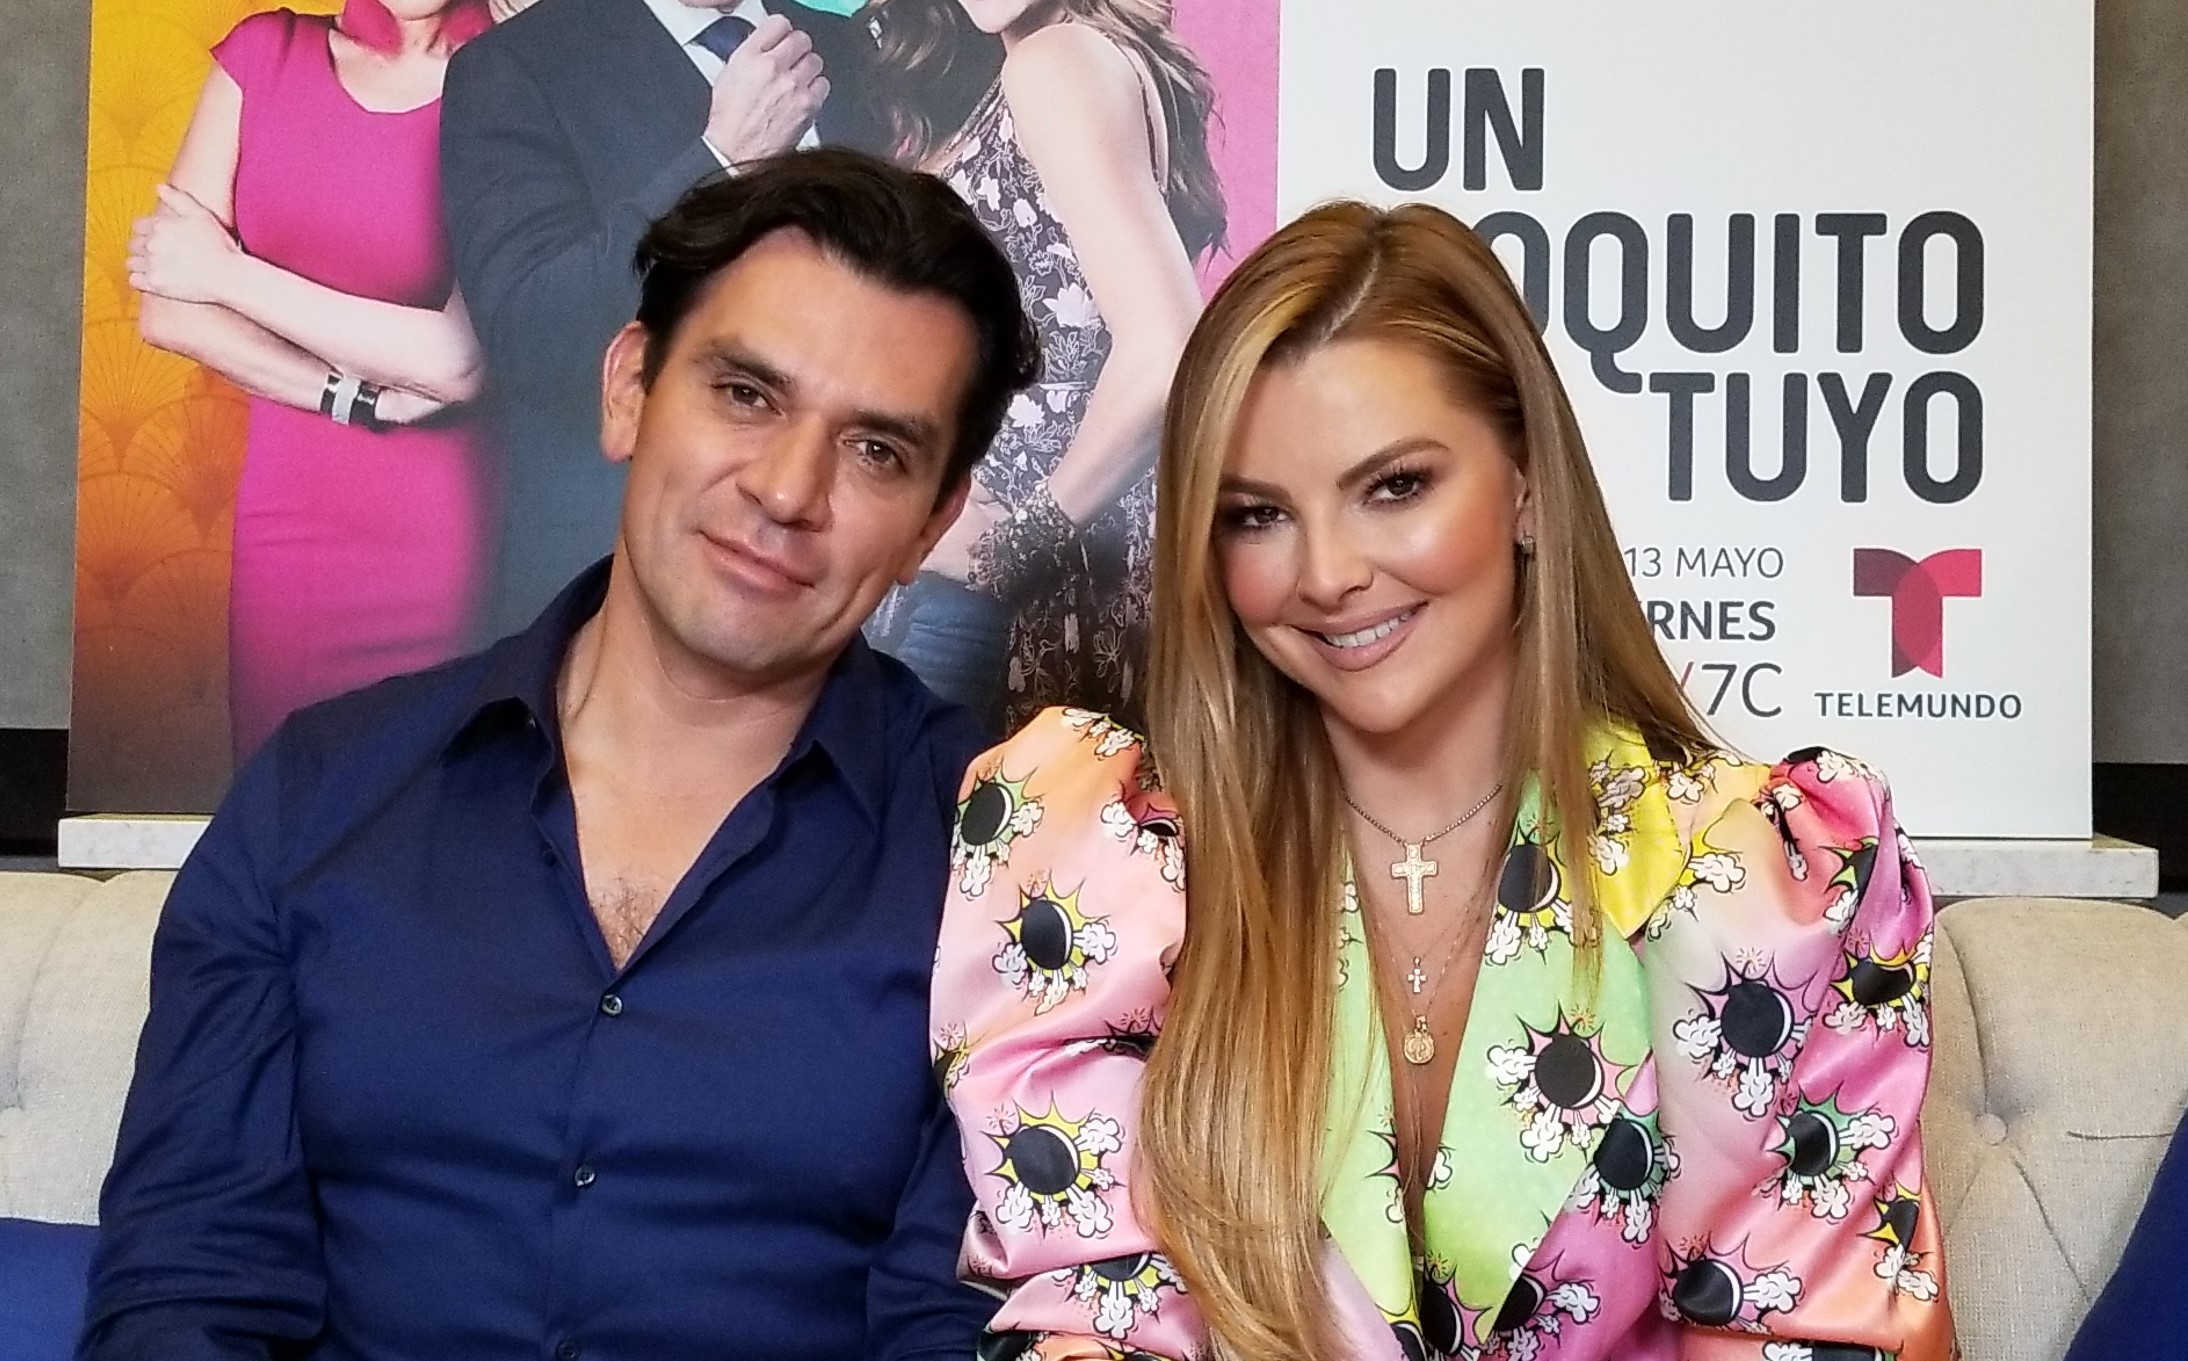 Jorge Salinas y Marjorie de Sousa en Un Poquito Tuyo.jpg